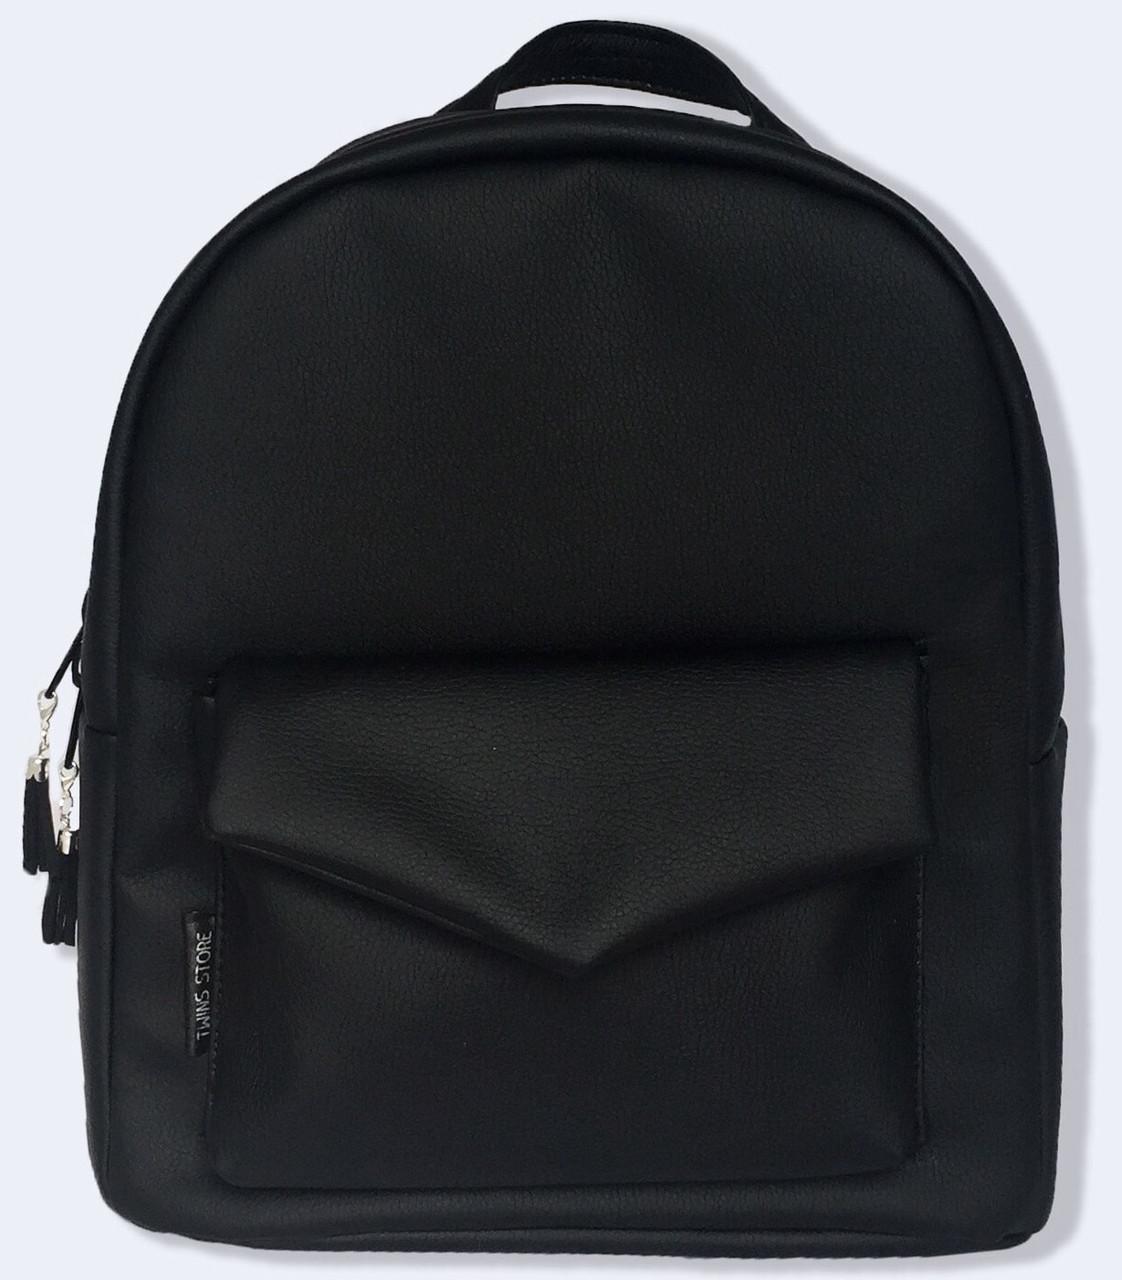 e392f91584f1 Кожаный женский рюкзак из эко-кожи TwinsStore, Р32 — только ...